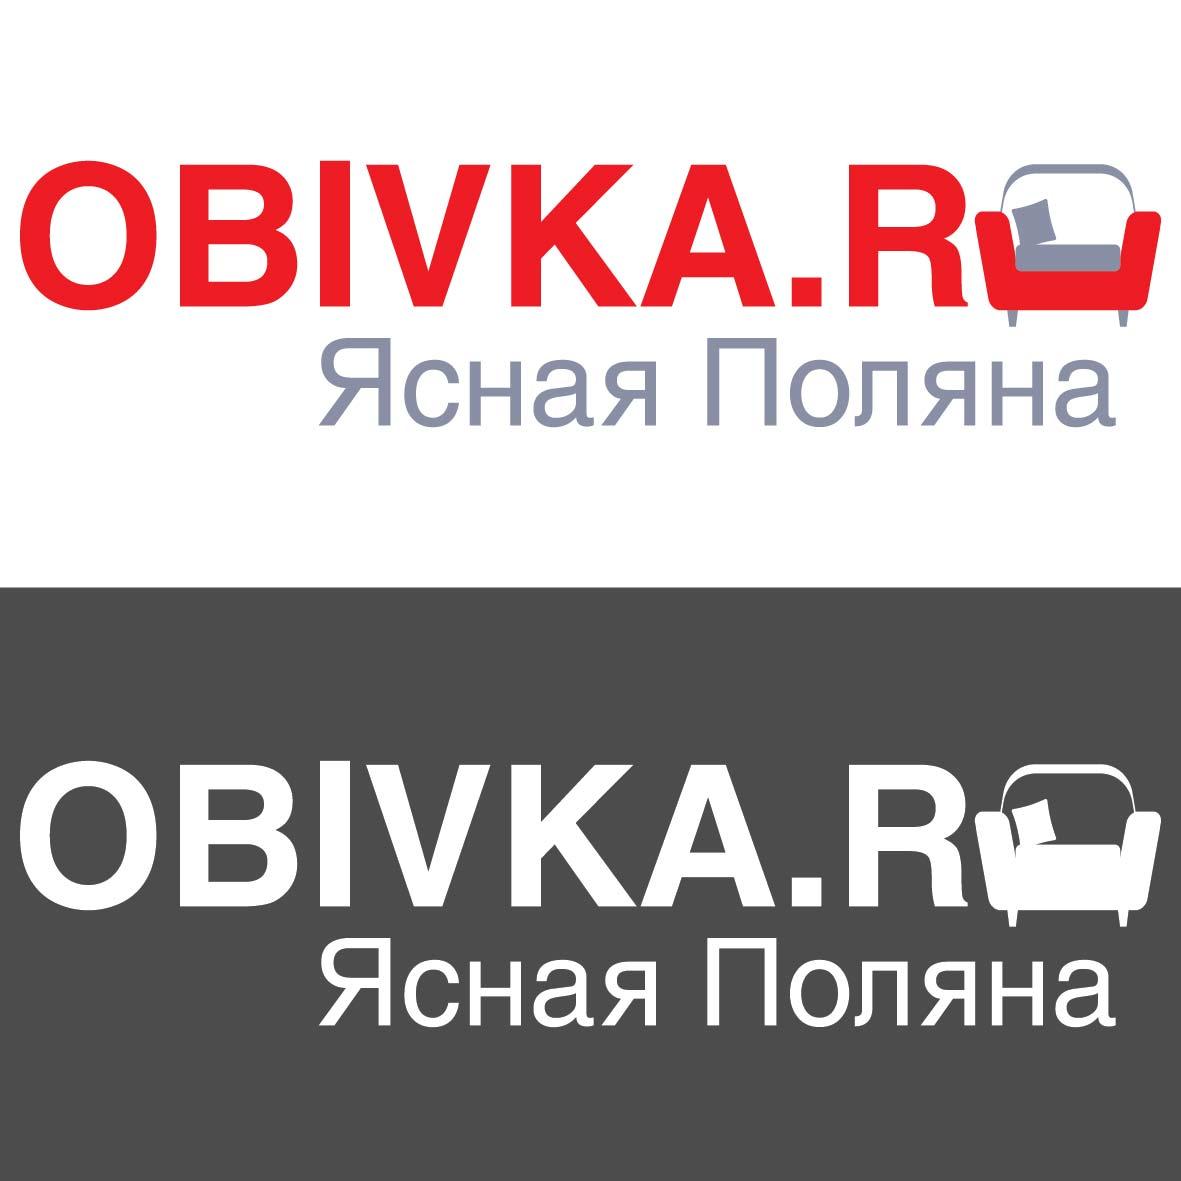 Логотип для сайта OBIVKA.RU фото f_1145c10fdcfd2c28.jpg